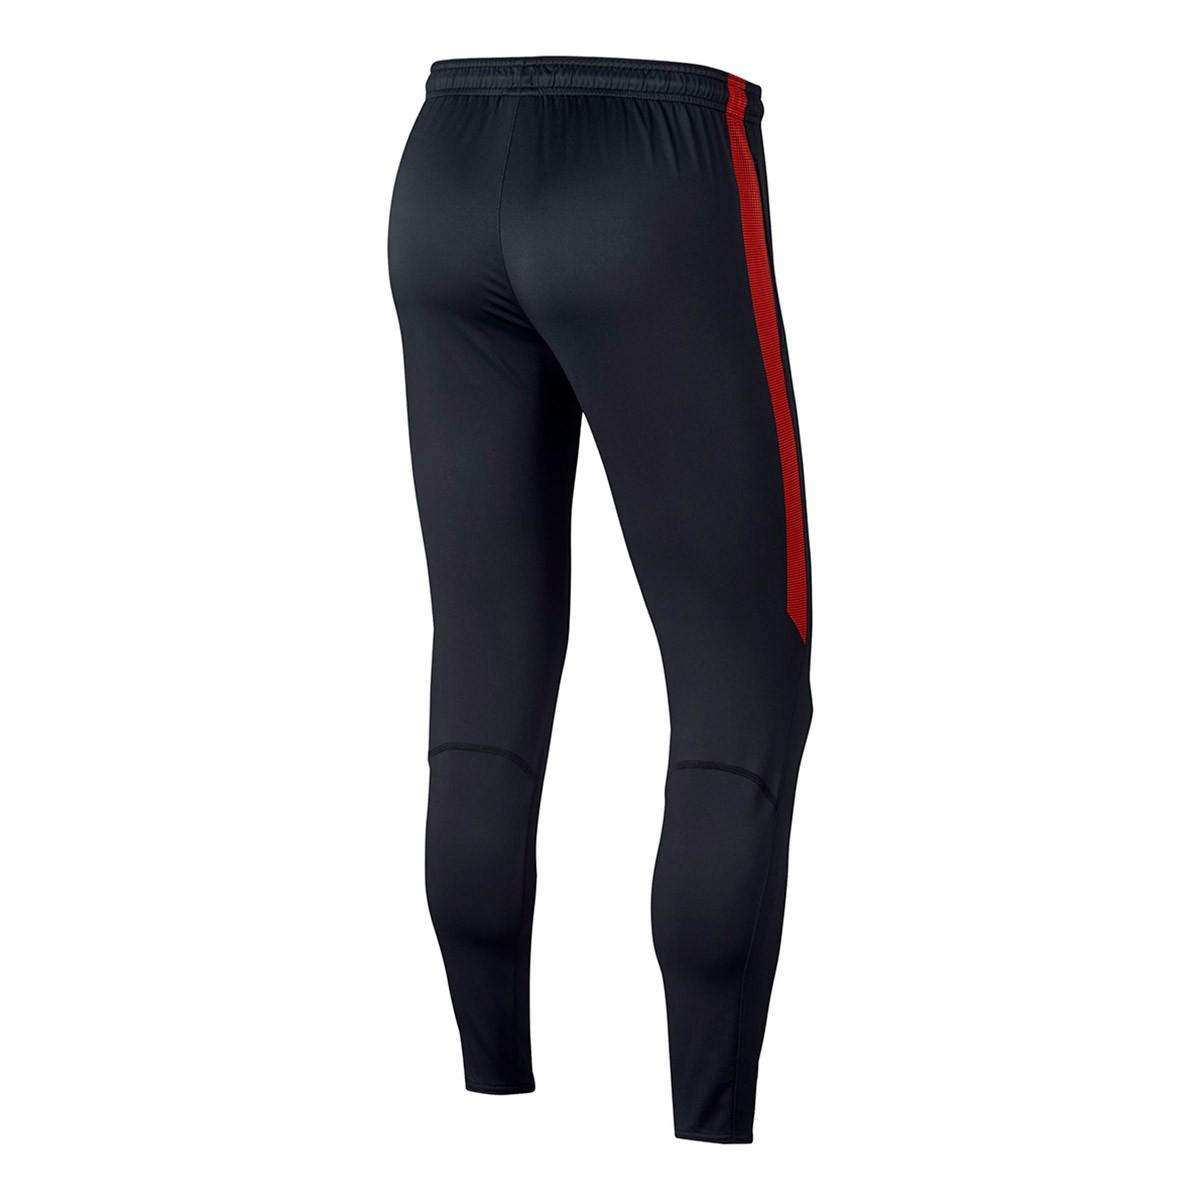 ded9e721 Long pants Nike Paris Saint-Germain Dry Squad KP CL 2018-2019  Black-University red - Football store Fútbol Emotion